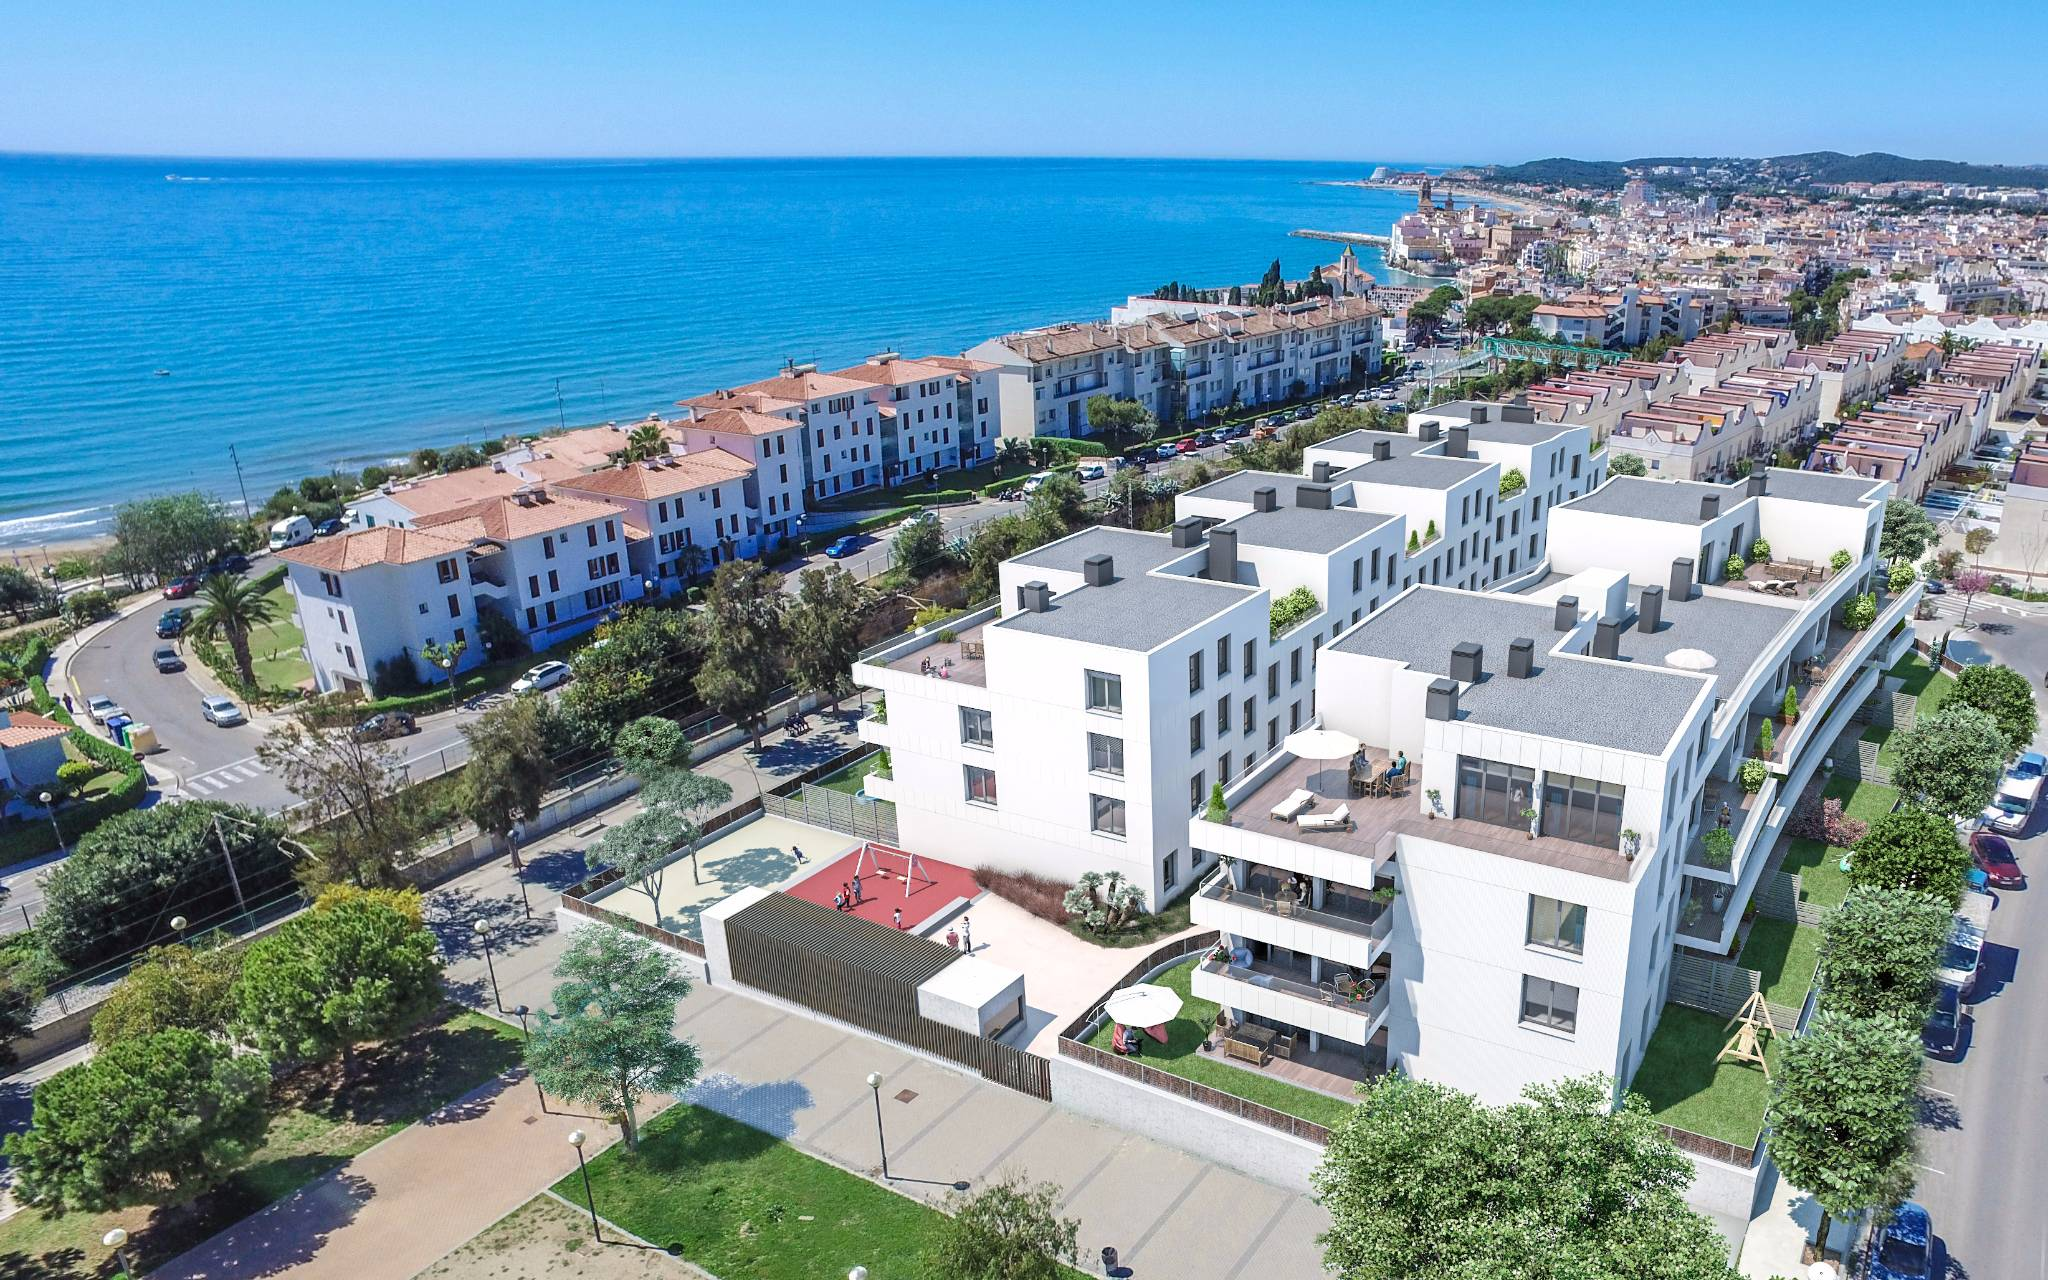 Render of one of Neinor Homes developments on the Spanish coast